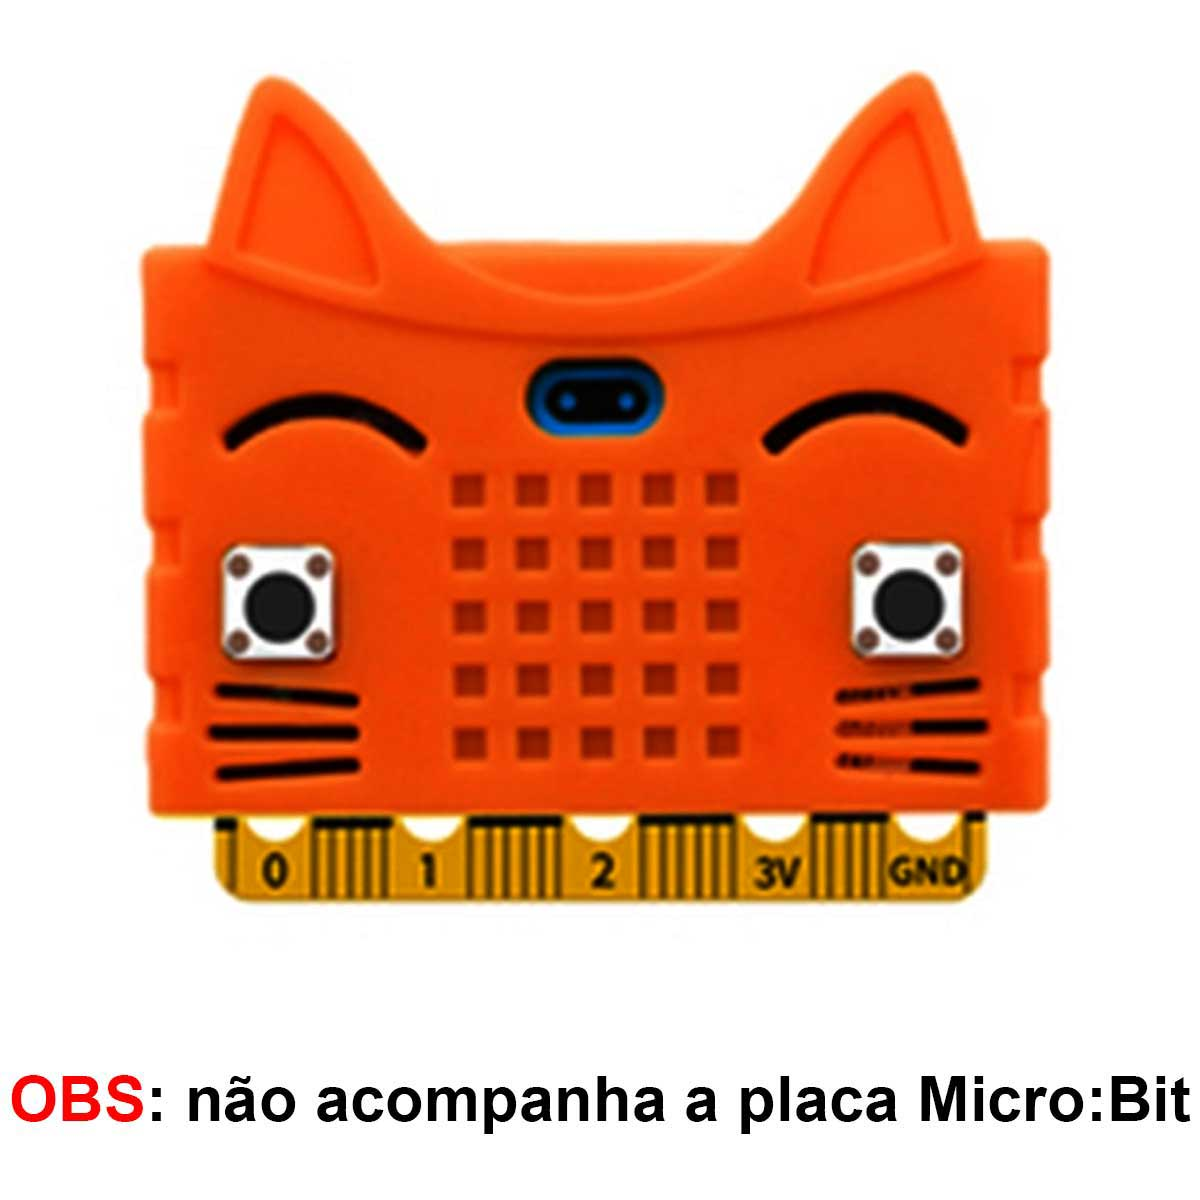 Case de Silicone Gato para proteger a Placa Micro:bit Microbit